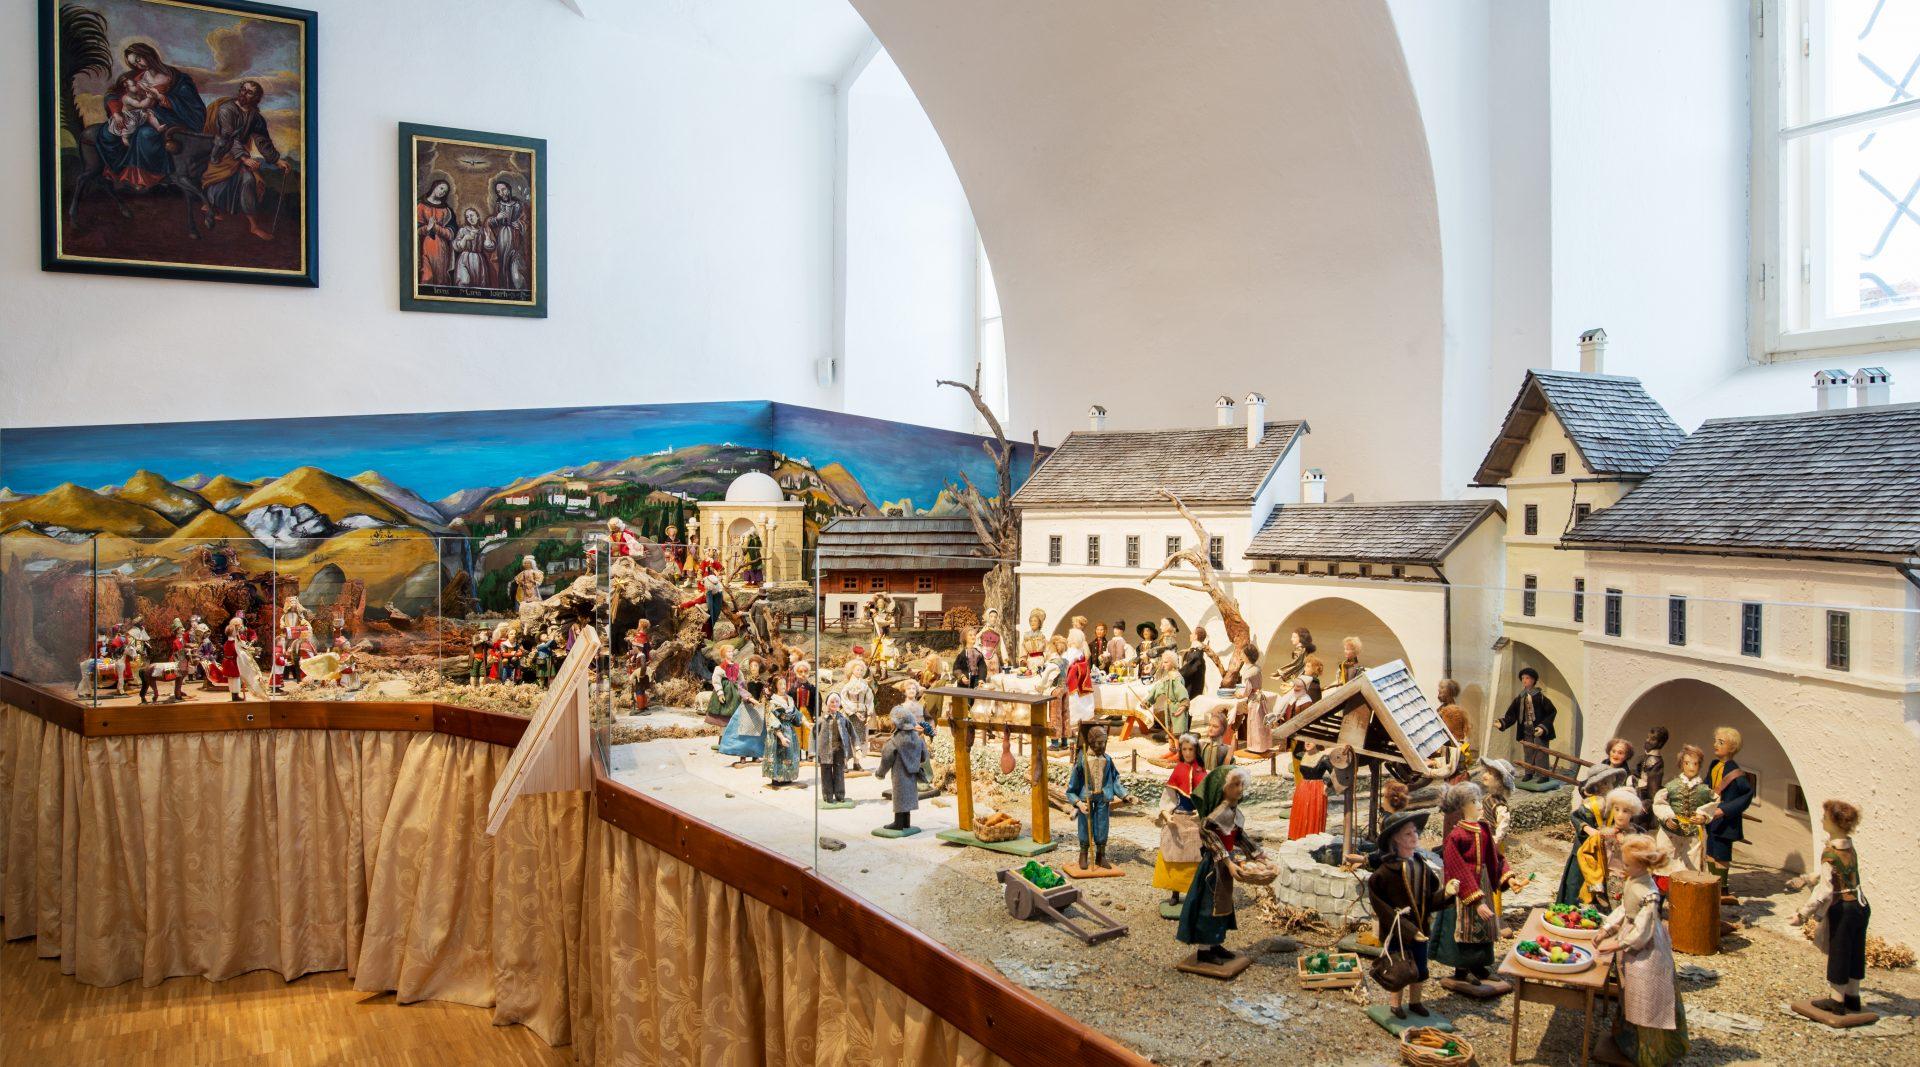 © SalzburgerLand Tourismus, Kathrin Gollackner - Stille Nacht Krippe im Museum Mariapfarr